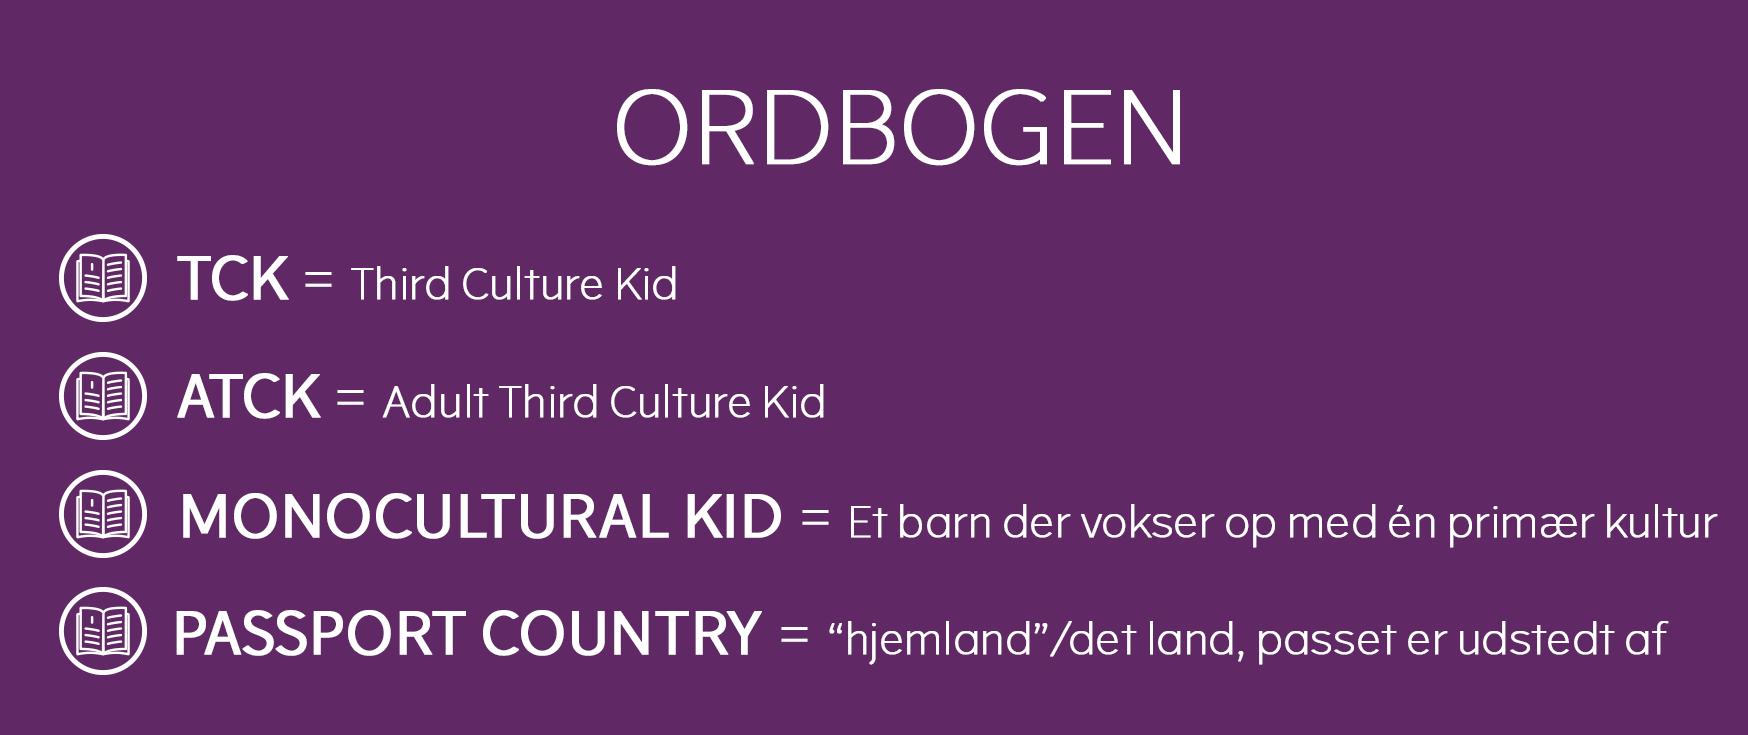 third culture kids (TCK) ordbogen